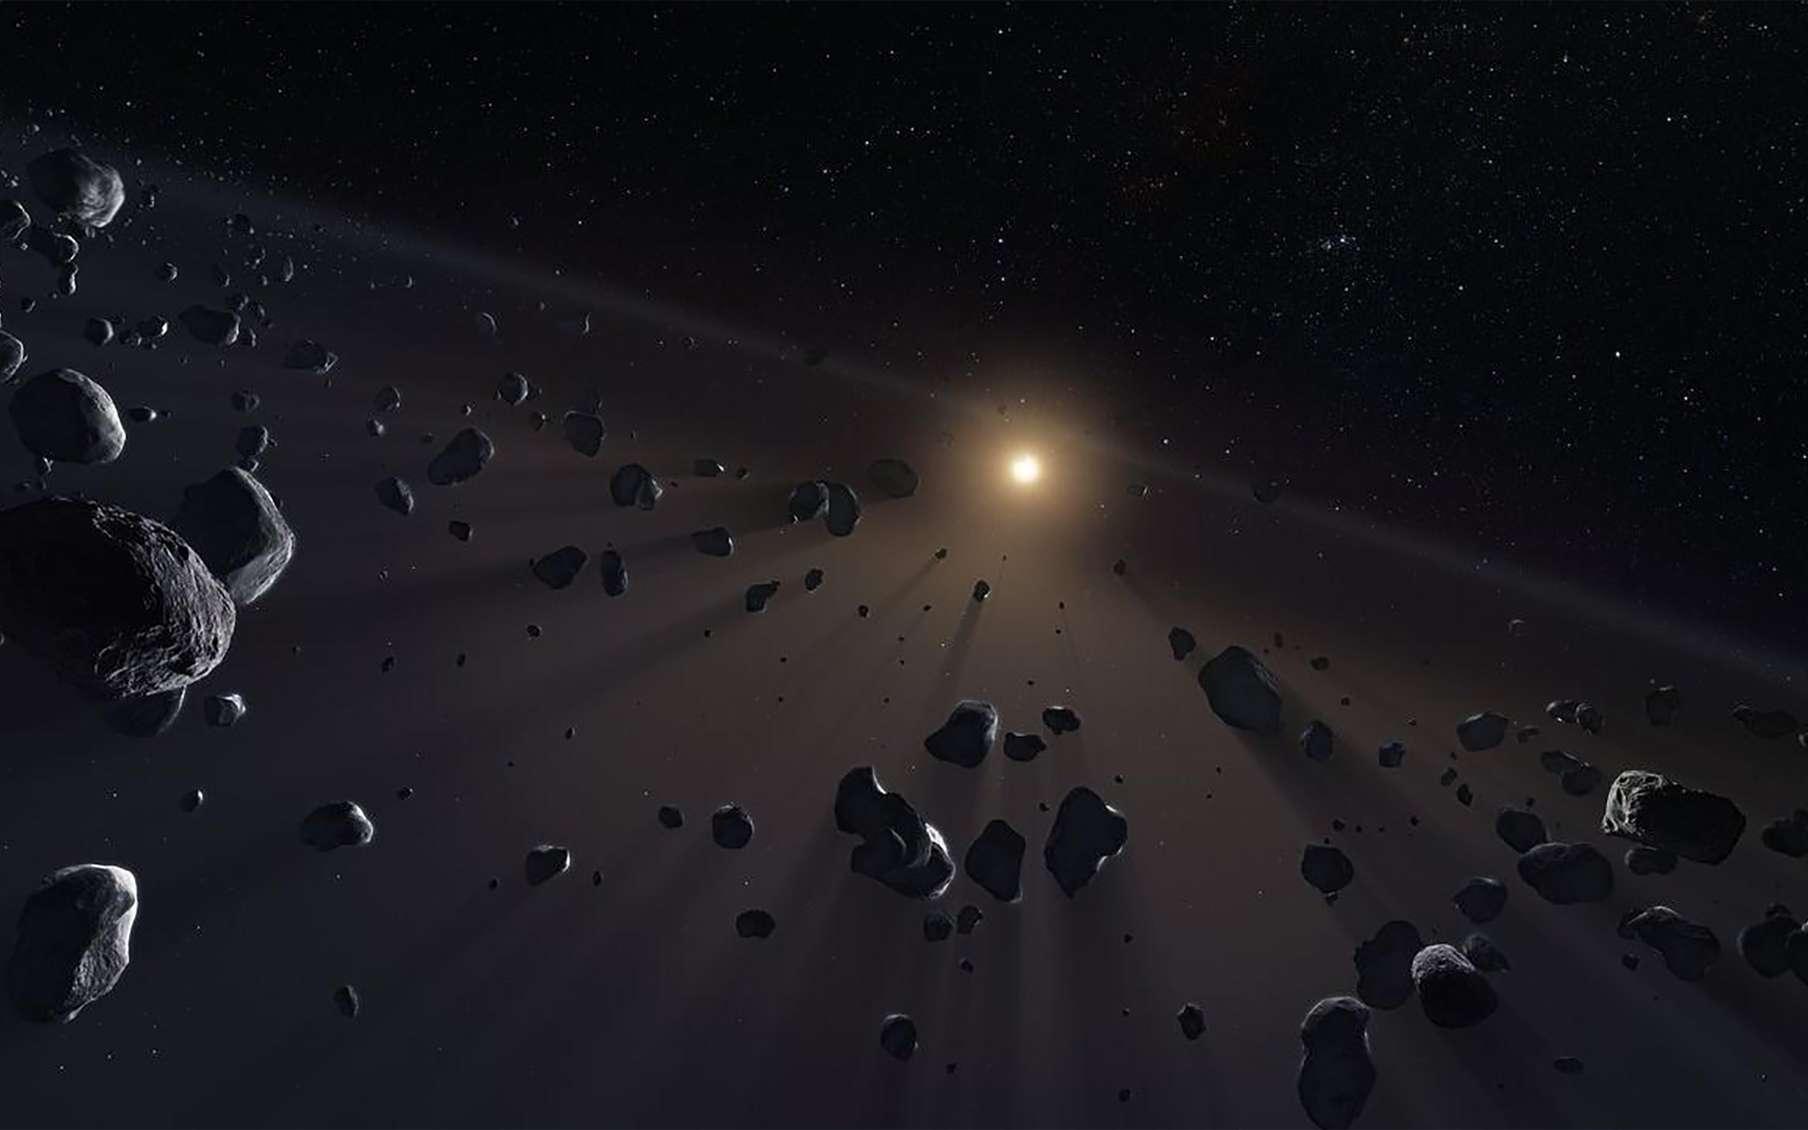 Vue d'artistes d'astéroïdes de la Ceinture de Kuiper. © ESO, Kornmesser